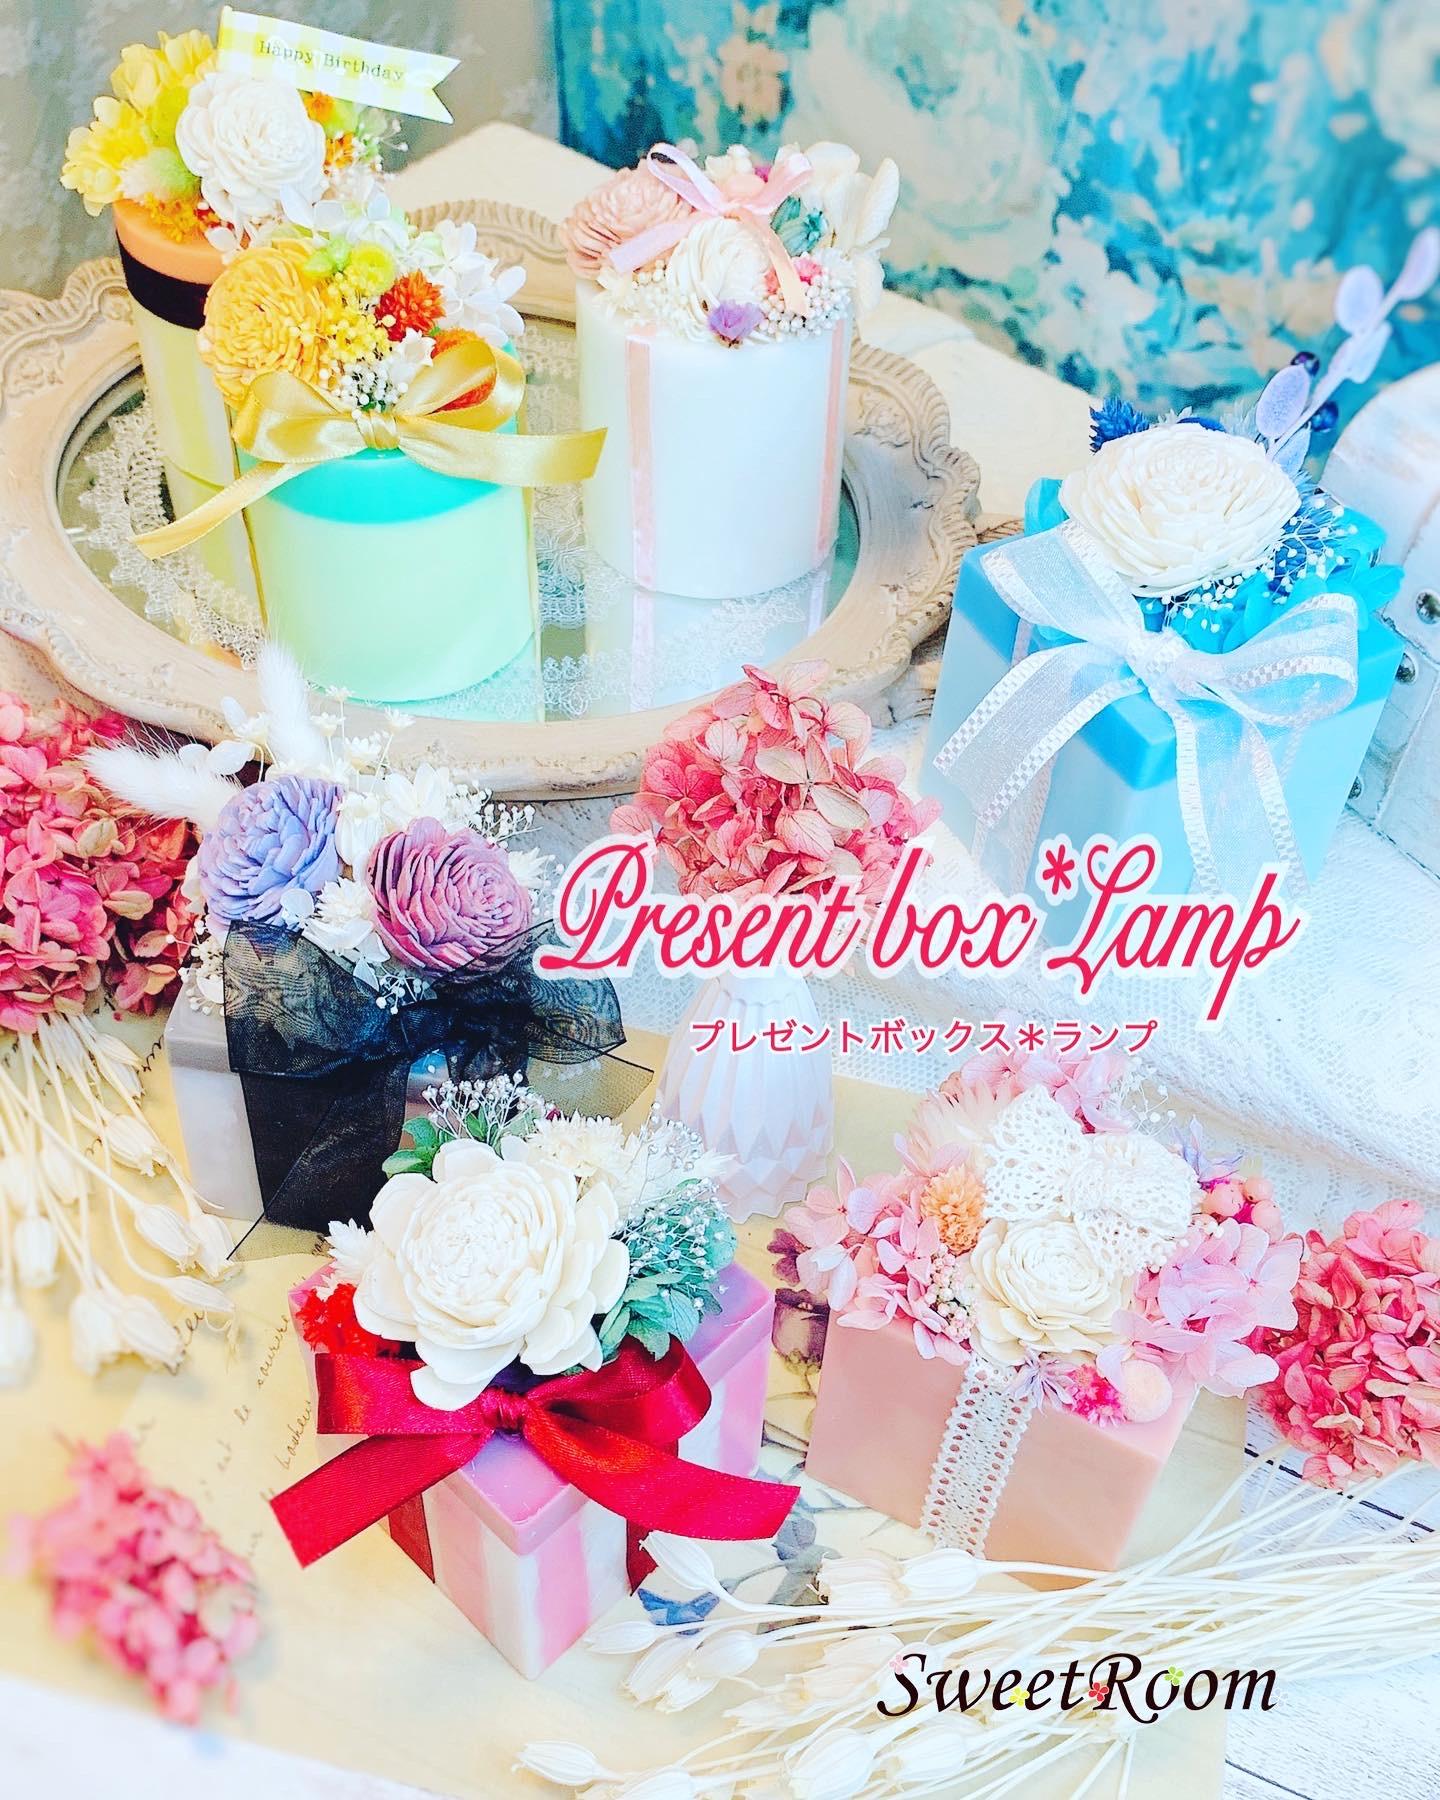 SweetRoom史上最強に可愛いプレゼントboxランプ